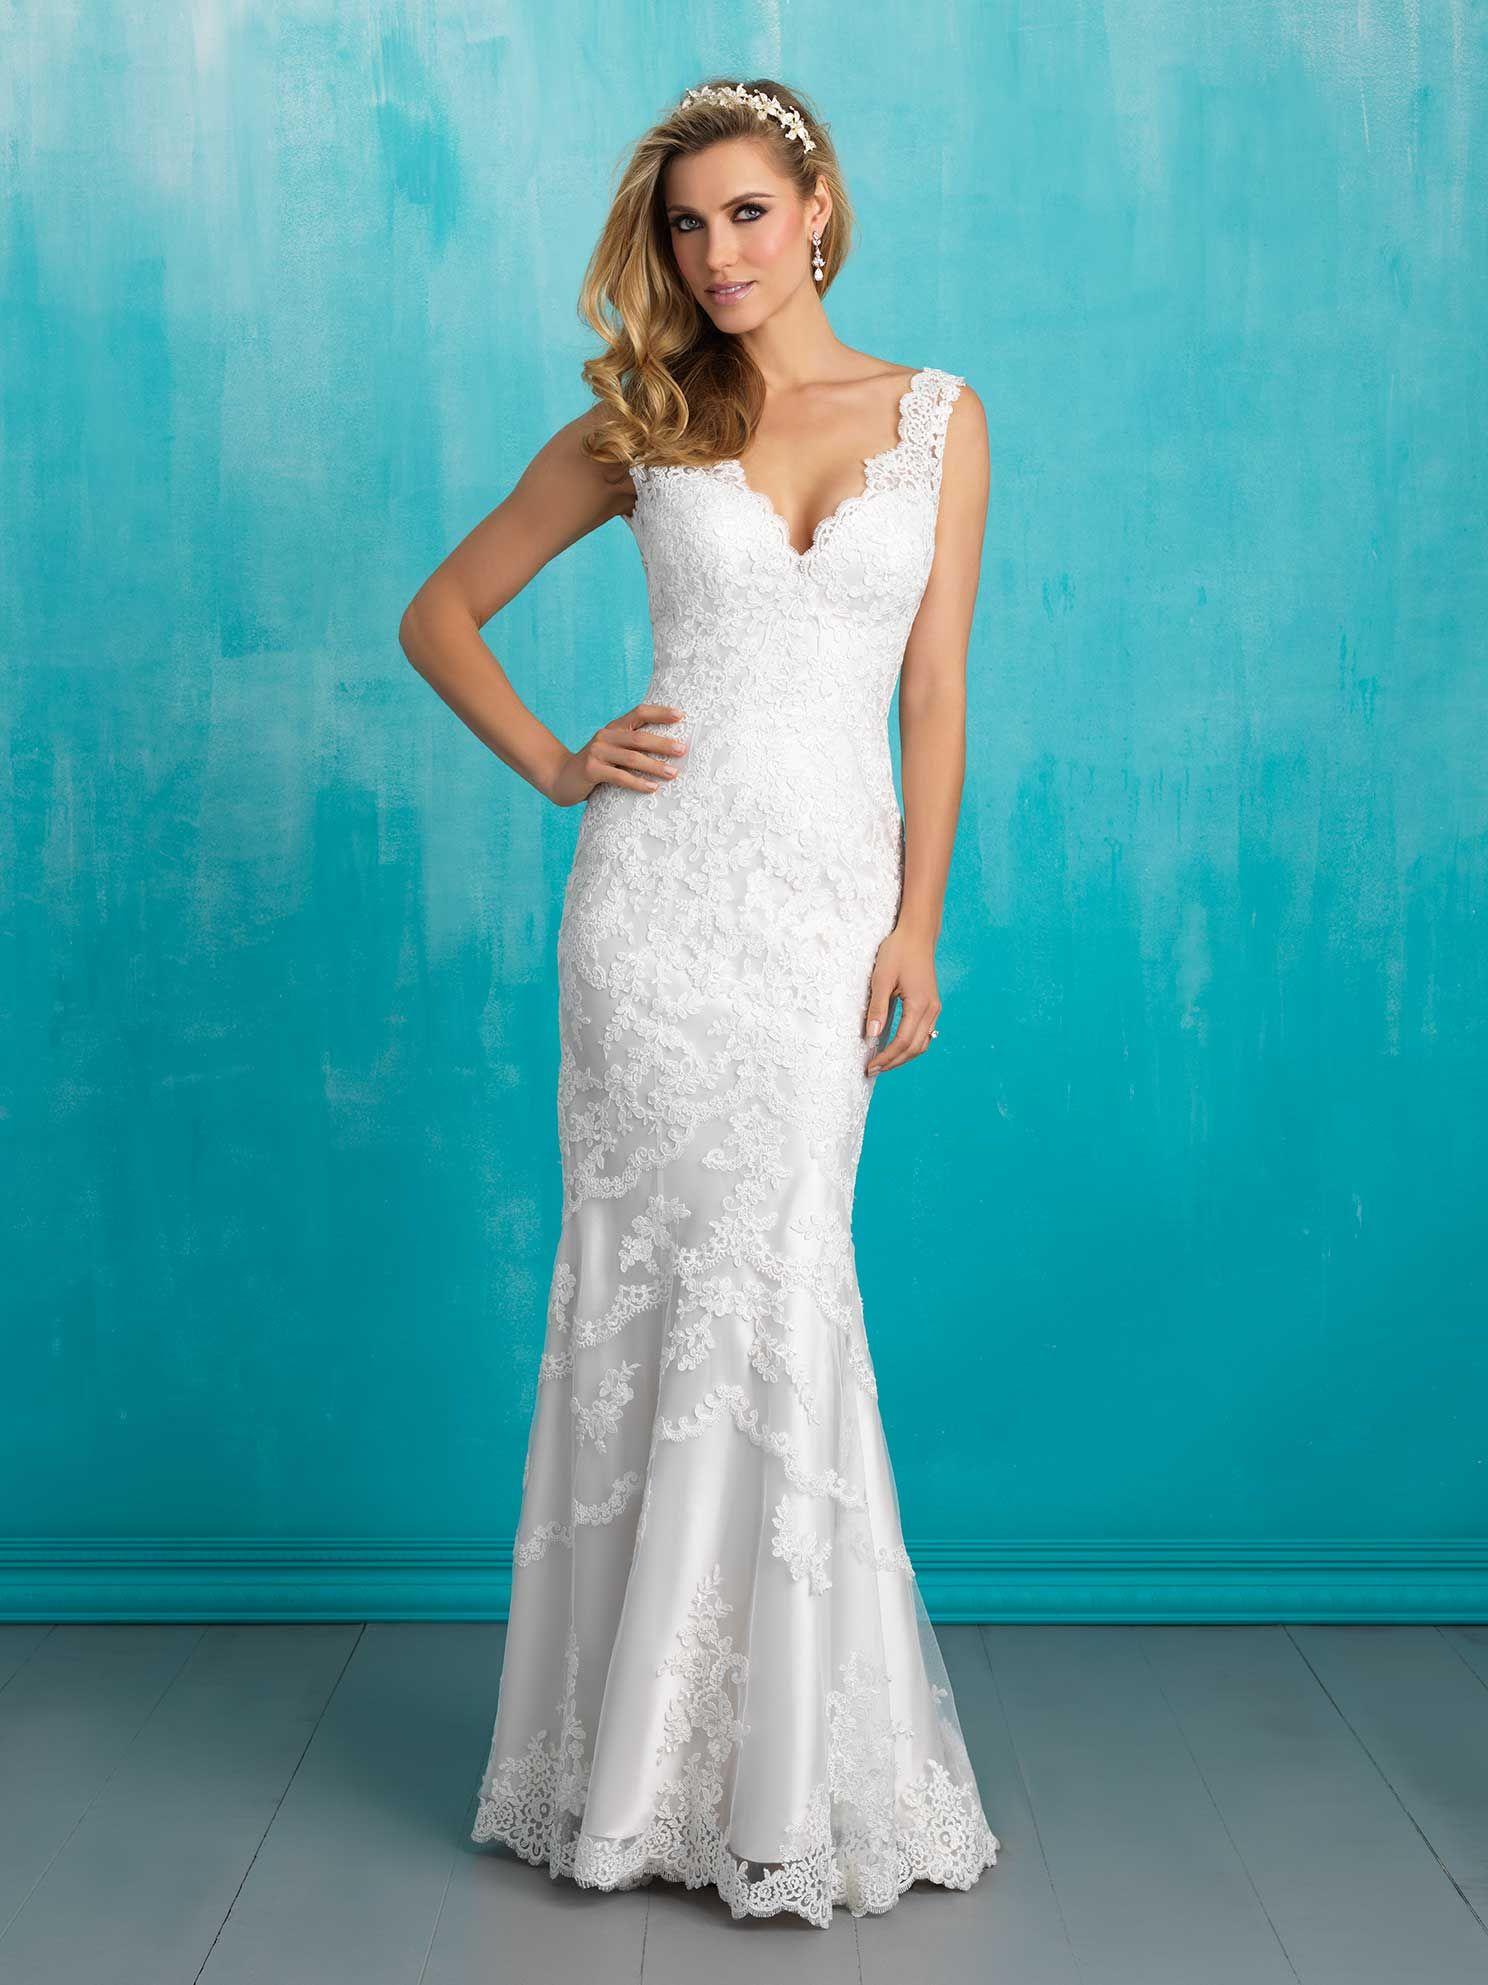 Elegant Consignment Wedding Dresses Las Vegas – Wedding